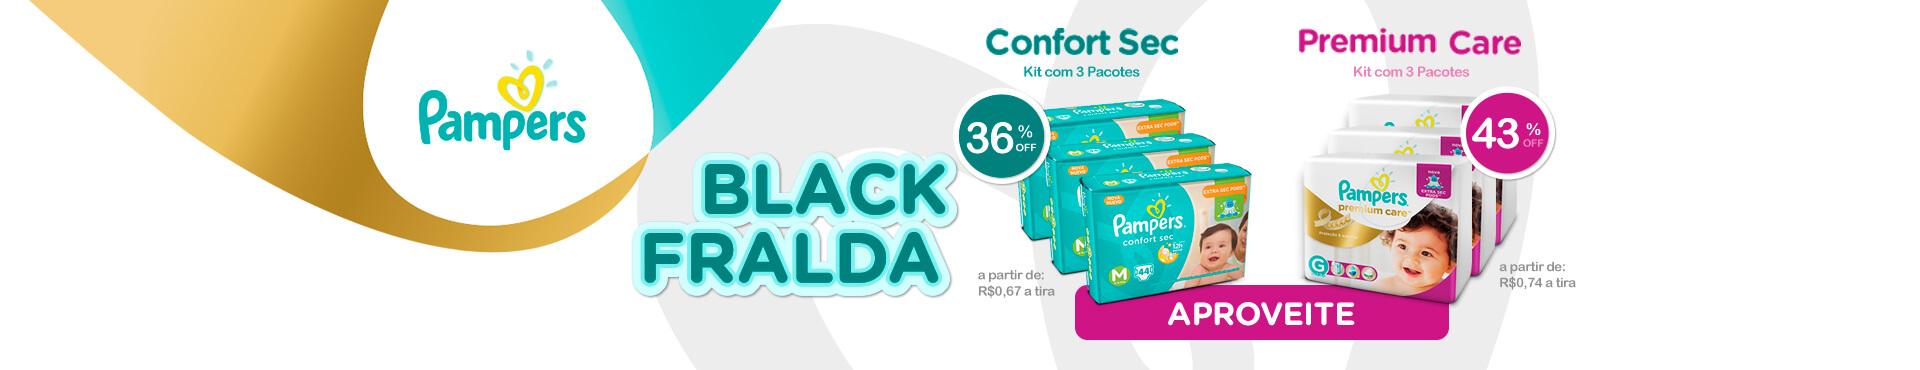 BlackFralda